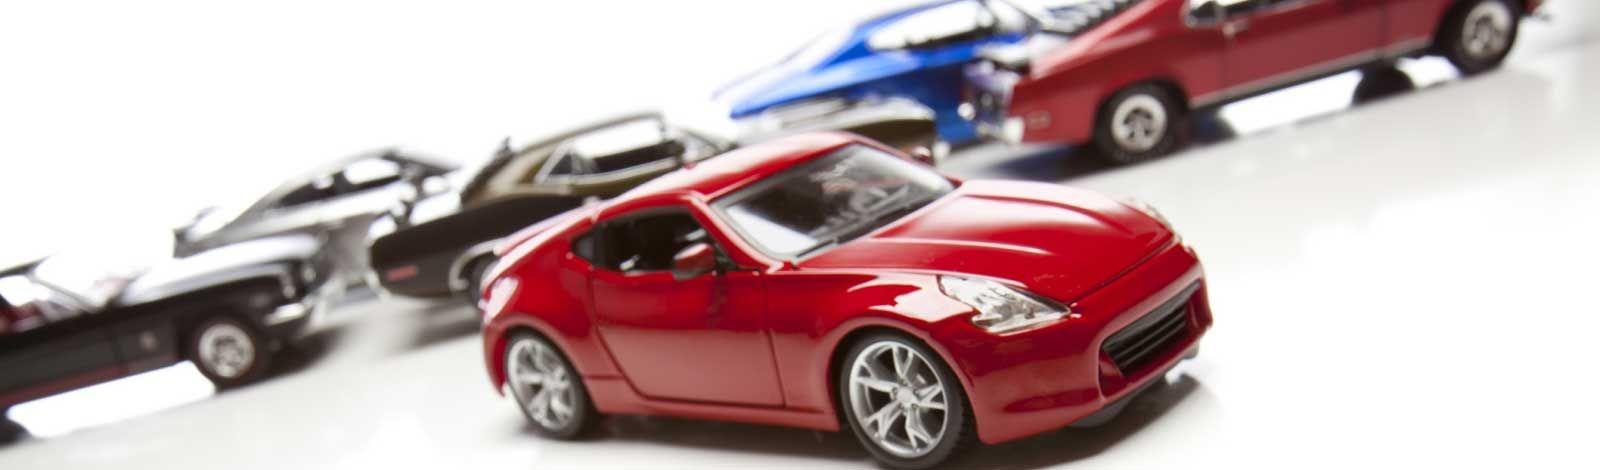 Low doc car loans perth car loans car finance finance